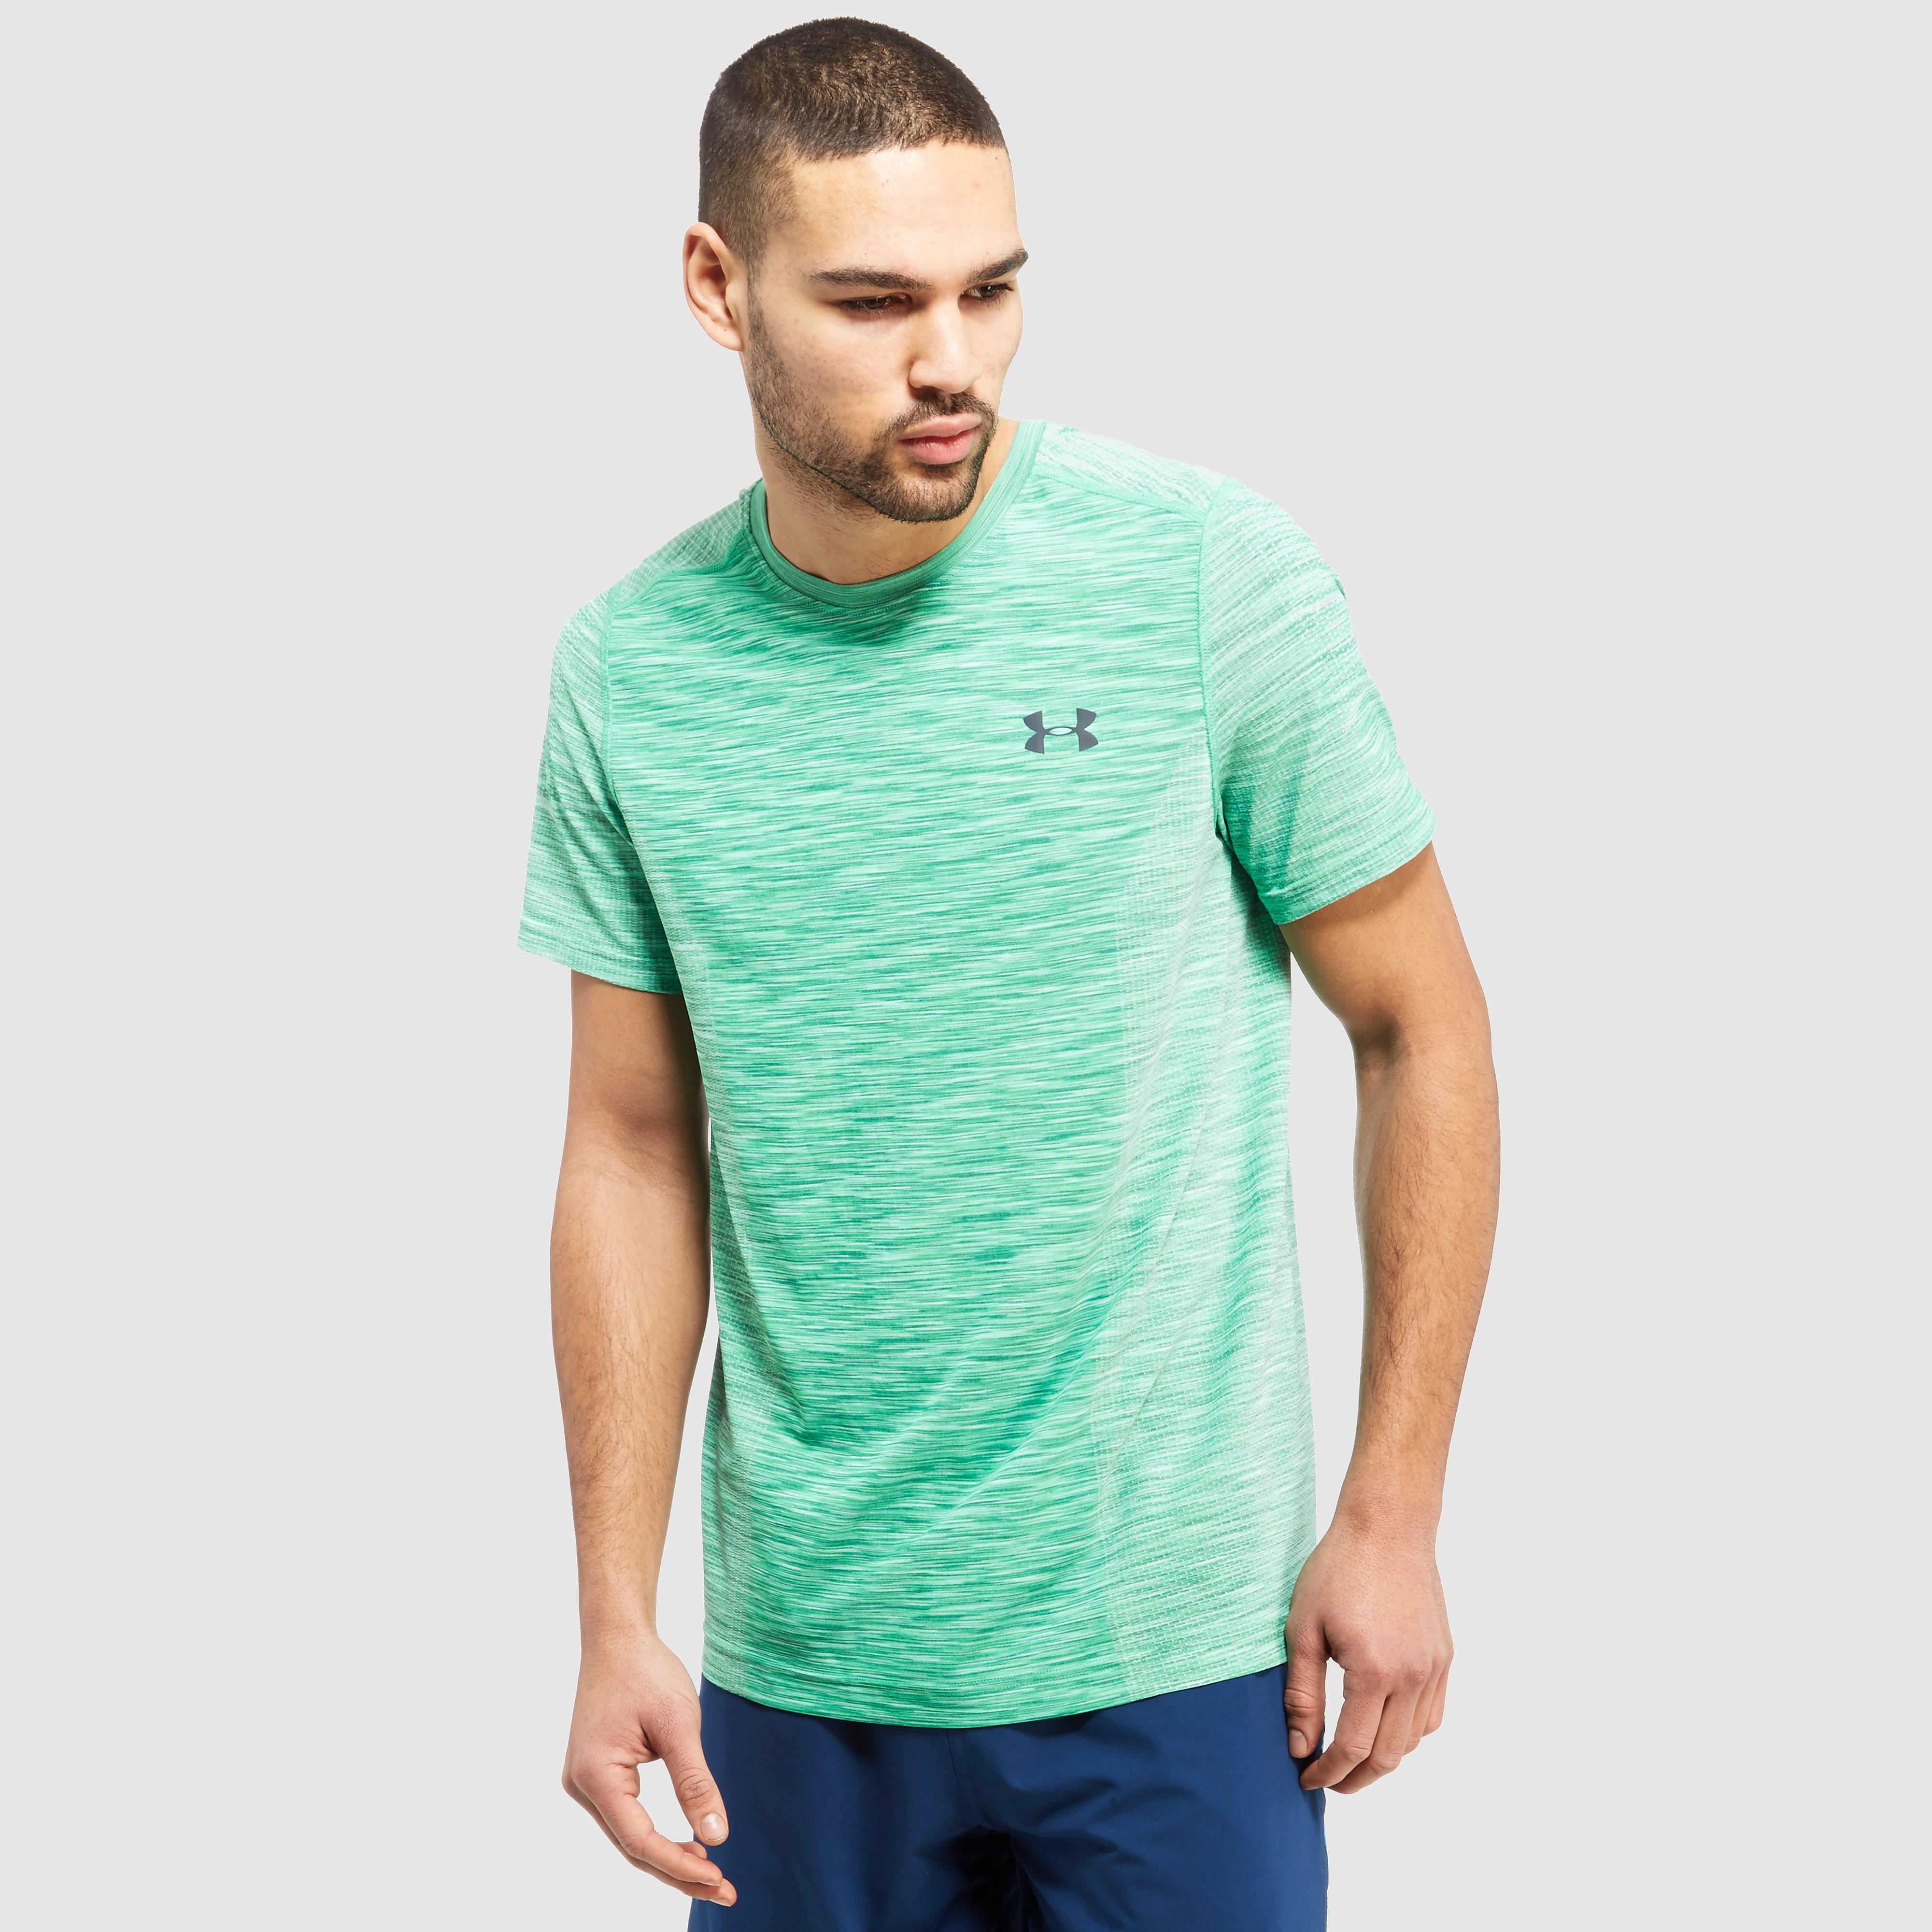 Under Armour Threadborne Streaker Run Short Sleeve Men's T-Shirt